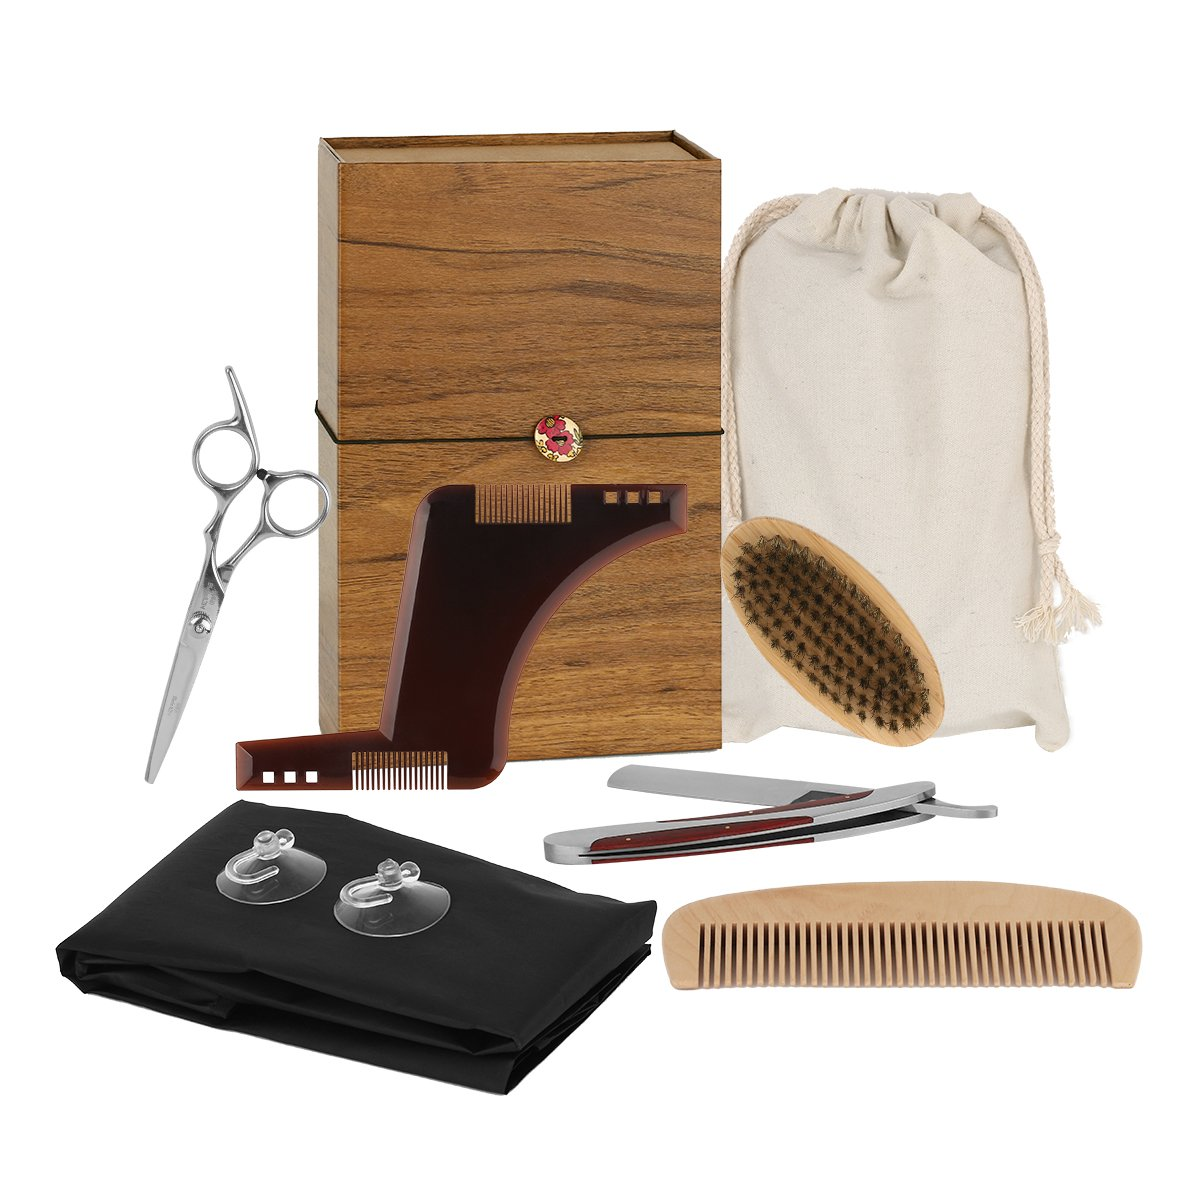 Beard Care Set, INKERSCOOP Beard Gift Set 7-Pieces Beard Brush + Stainless Beard Scissors + Manual Razor + Beard Mask + Beard Bib + Beard Combs + Gifts Box, Wanted Beauty Gift Set for Men and Barter